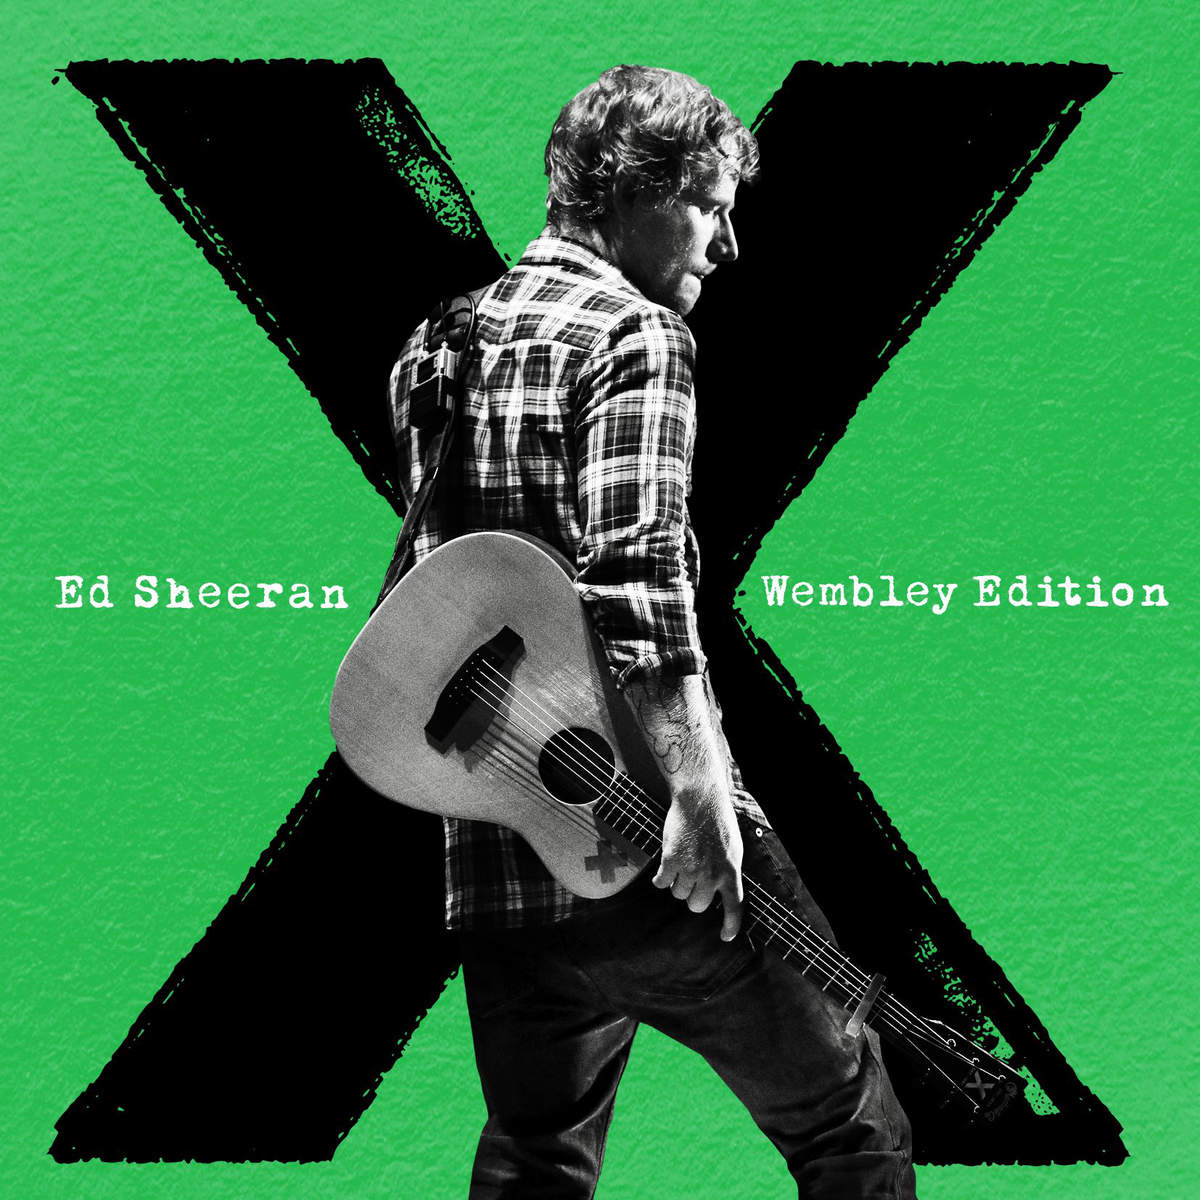 ed sheeran divide album download deviantart